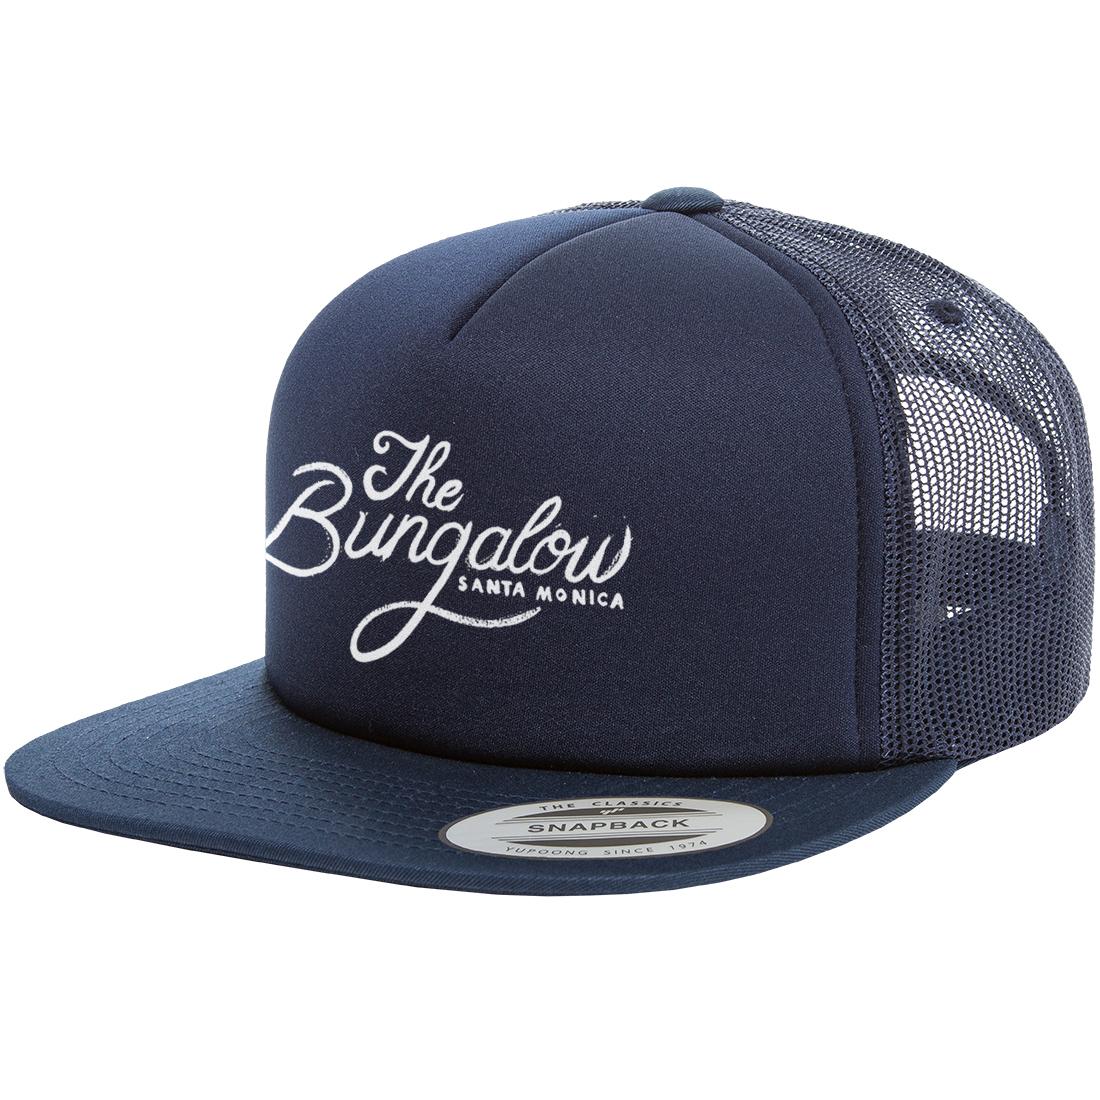 THE_BUNGALOW-HAT_MOCK-NAVY.jpg